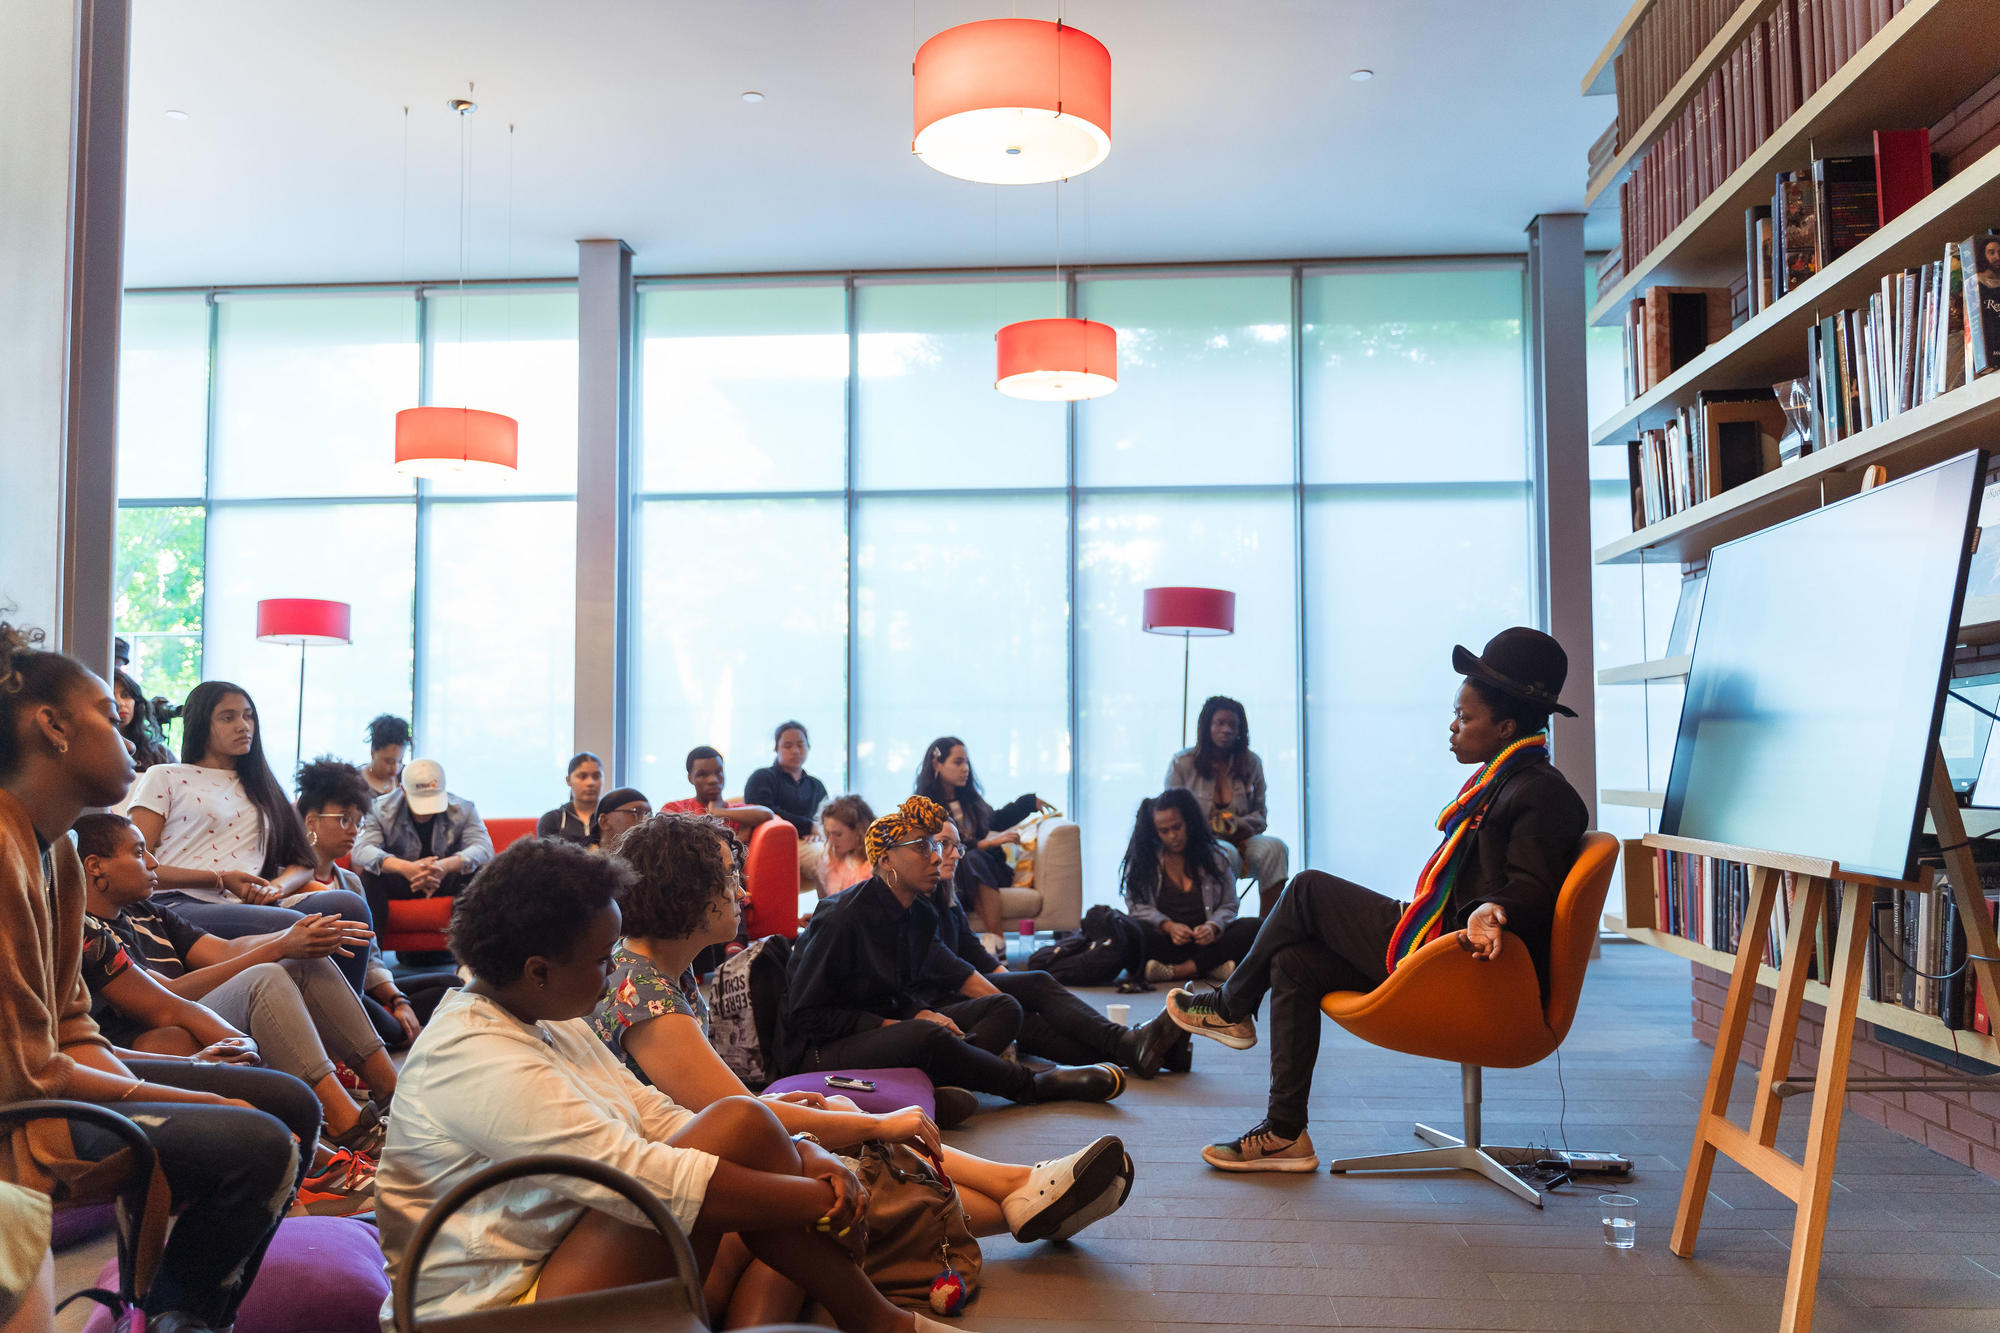 Artist-in-Residence Zanele Muholi gives a talk in the Living Room in 2019, photo by Faizal Westcott